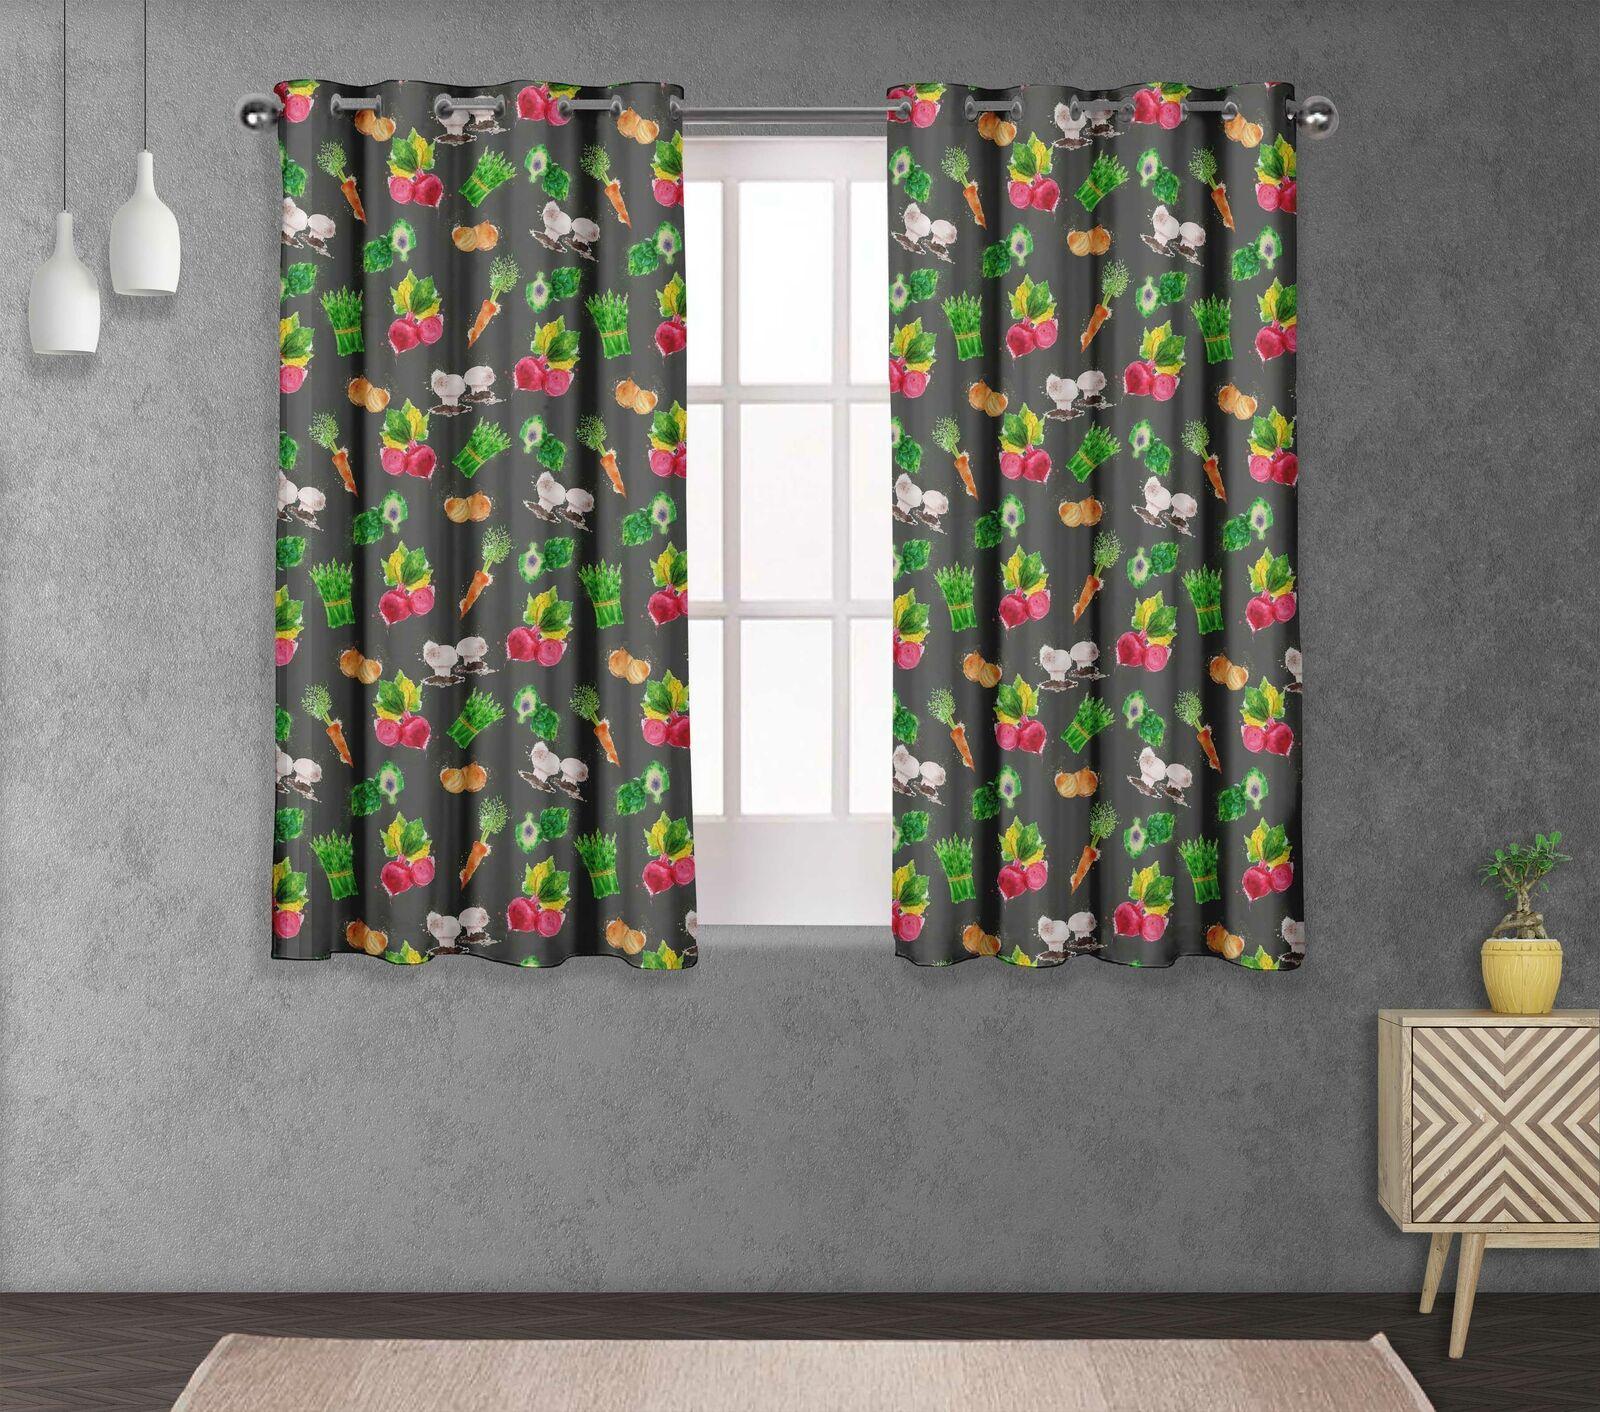 S4sassy Mixed Double Panel Window Treatment Curtain -VG-508B